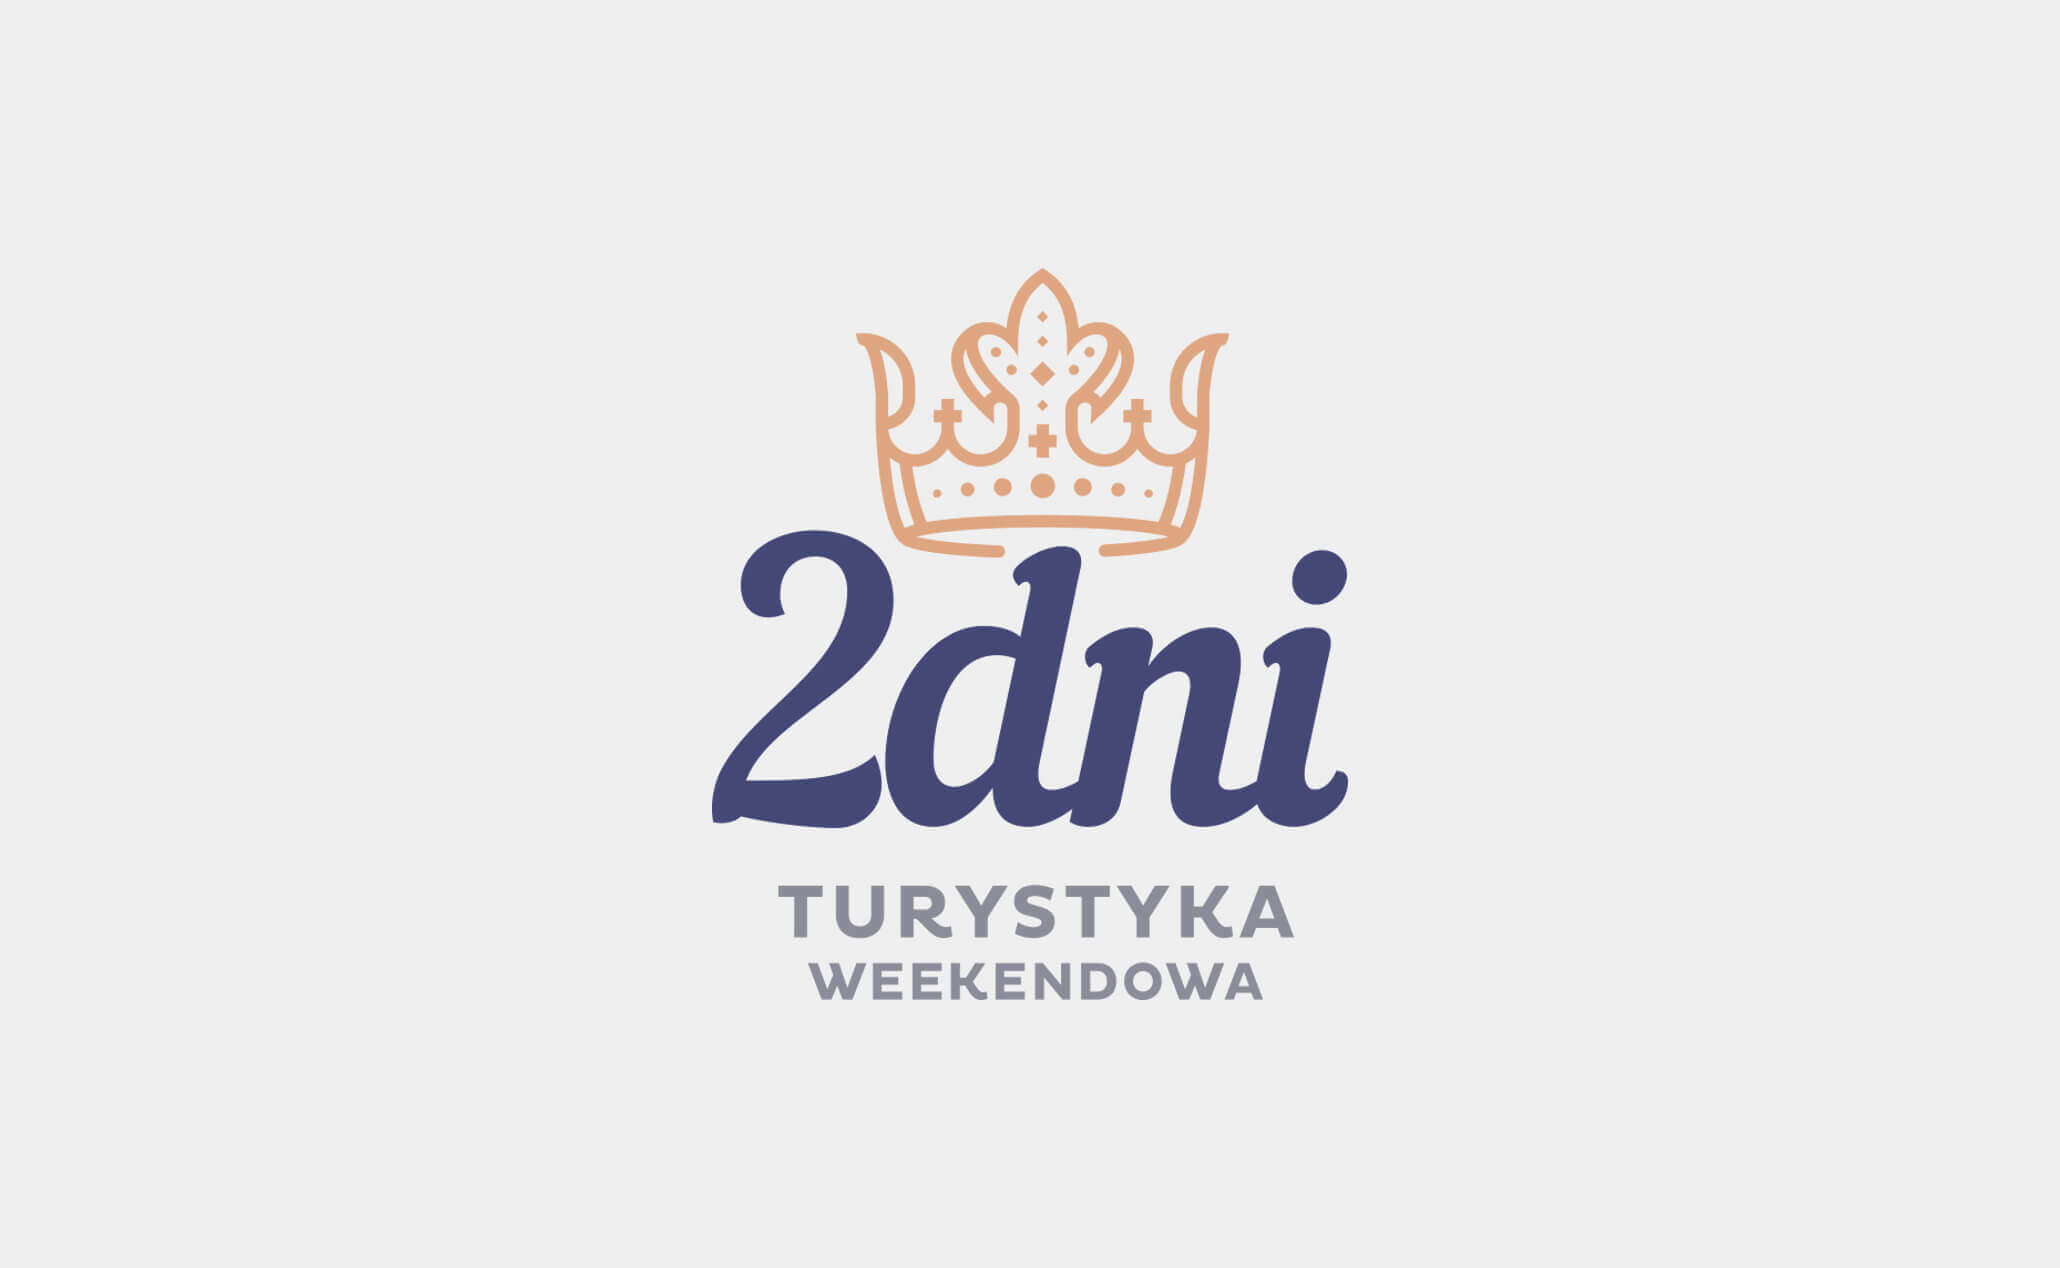 two-days-logo-design